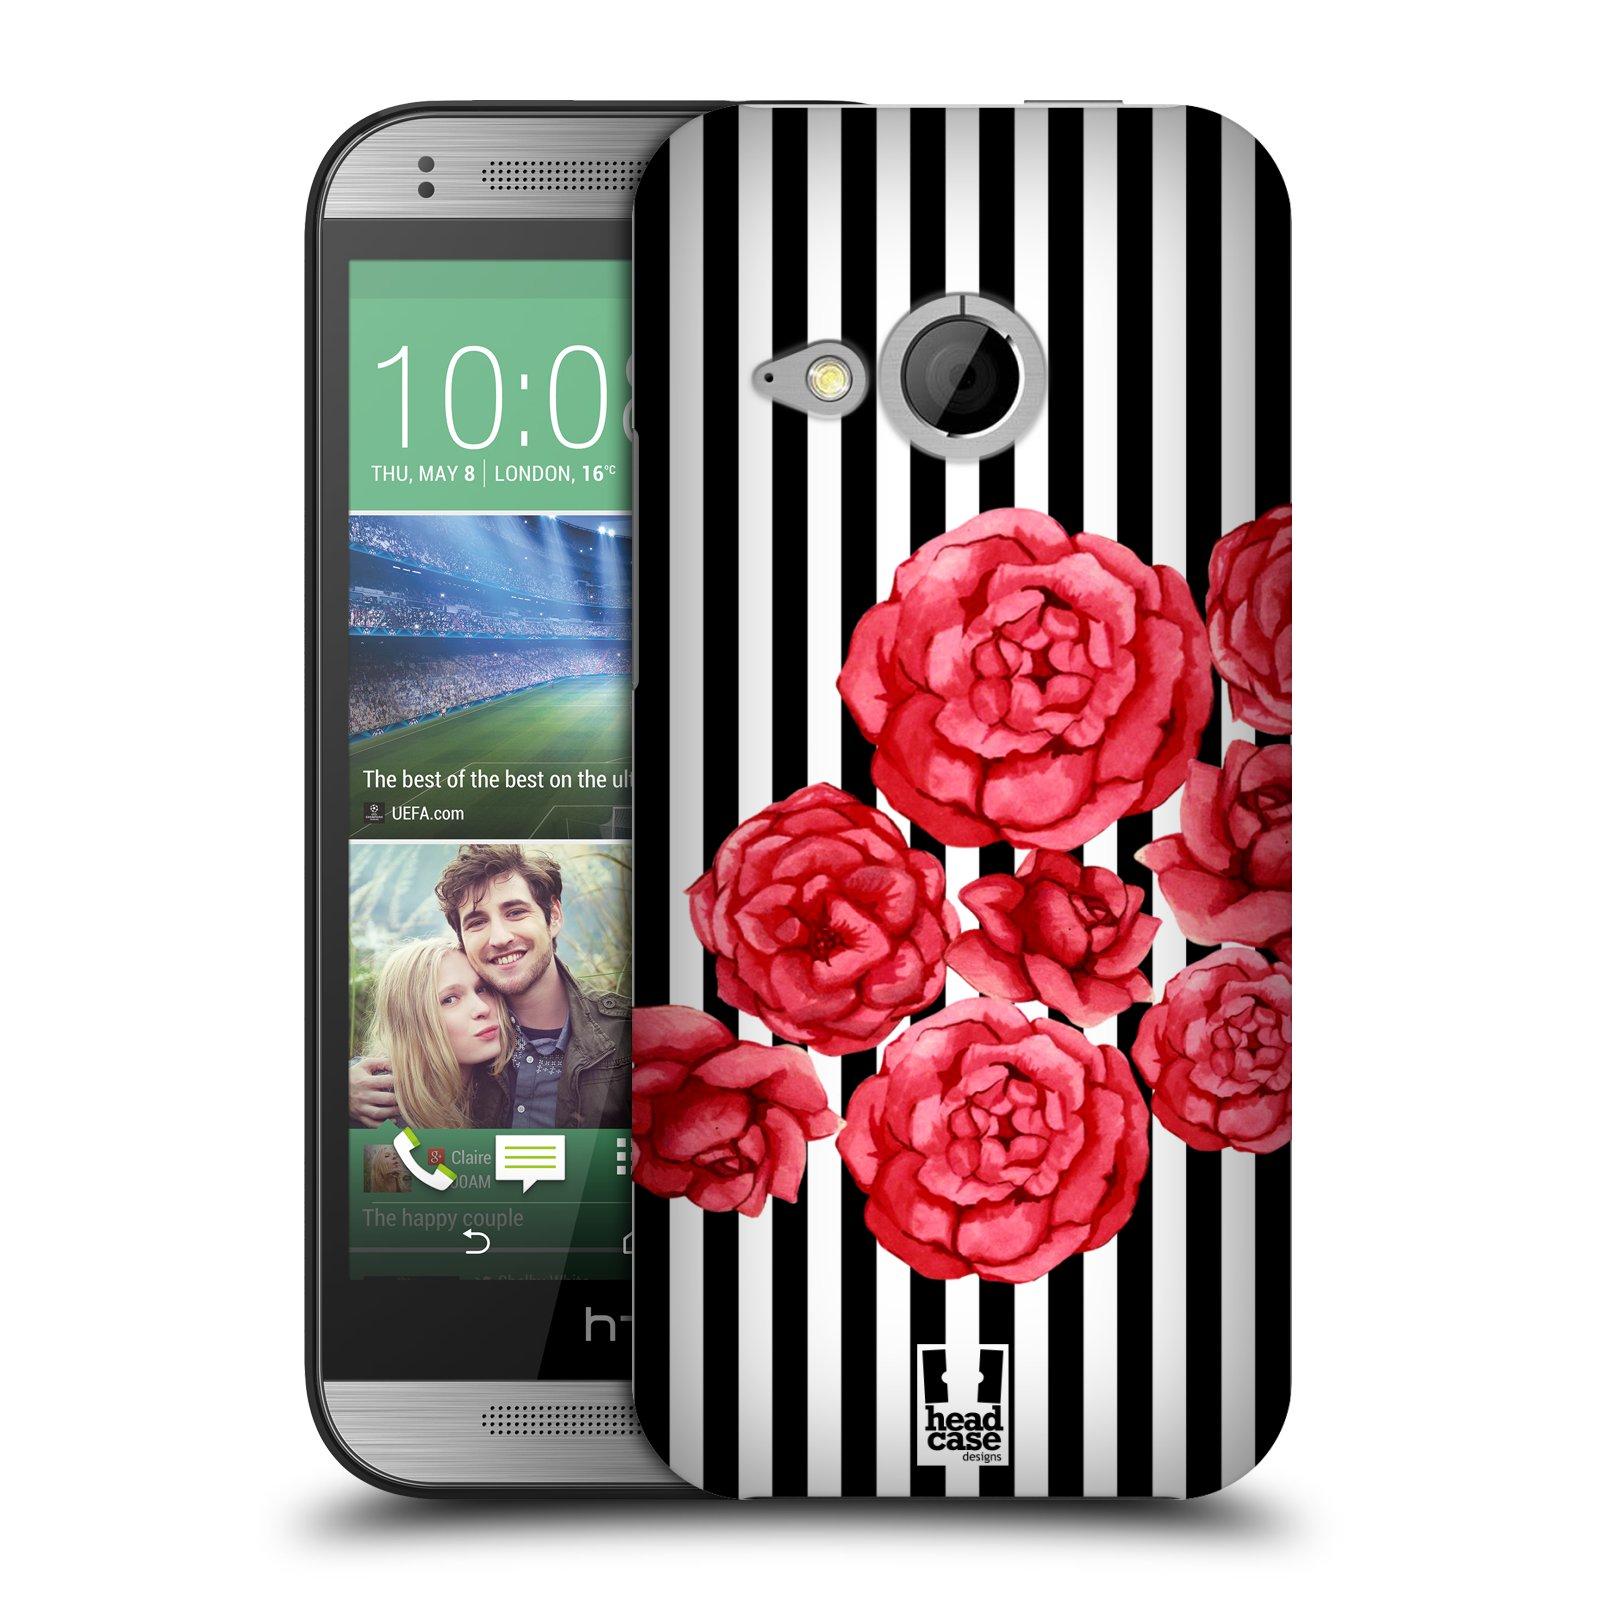 HEAD CASE DESIGNS LACRIMOSA HARD BACK CASE FOR HTC ONE MINI 2